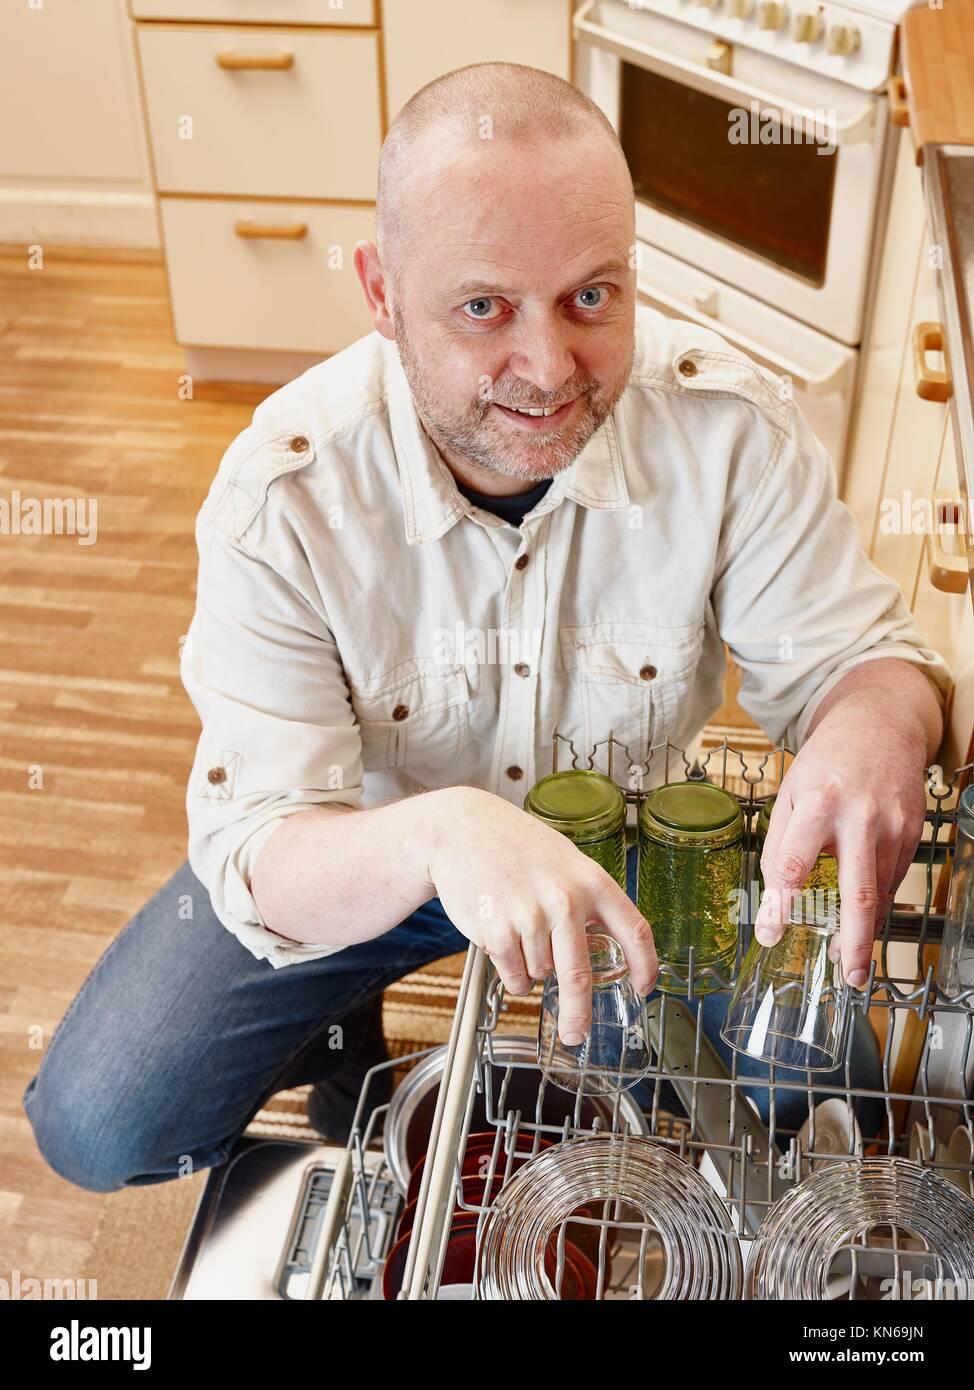 Homeworks, smiling man to fill the dishwasher. - Stock Image